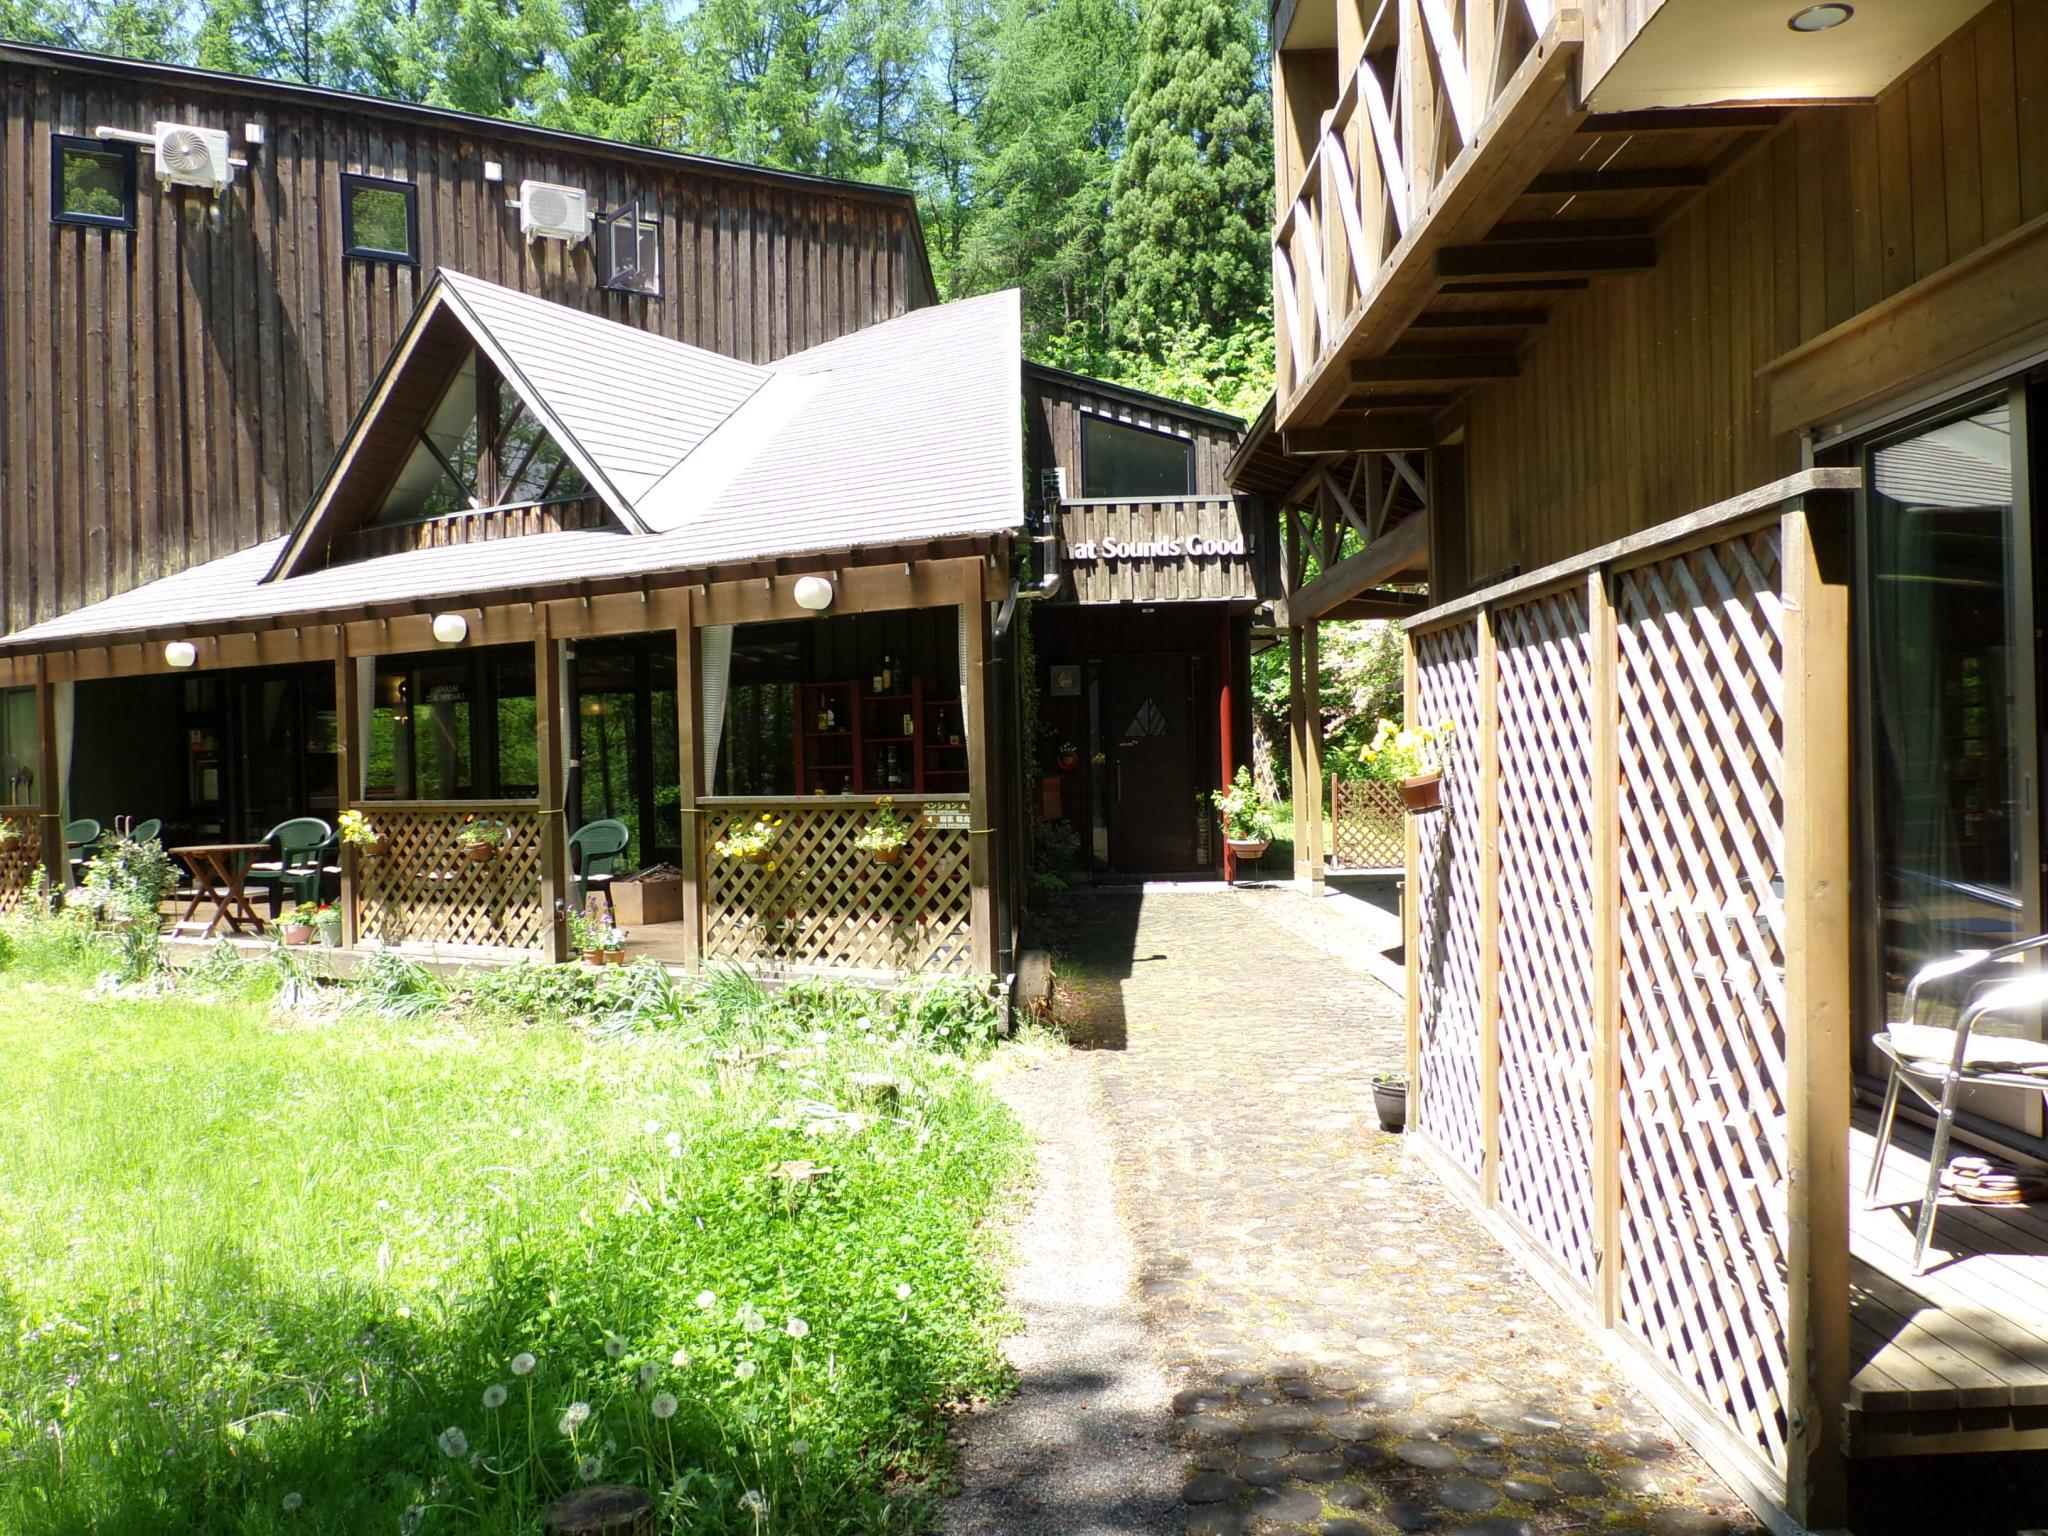 Cafe & inn That Sounds Good, Semboku